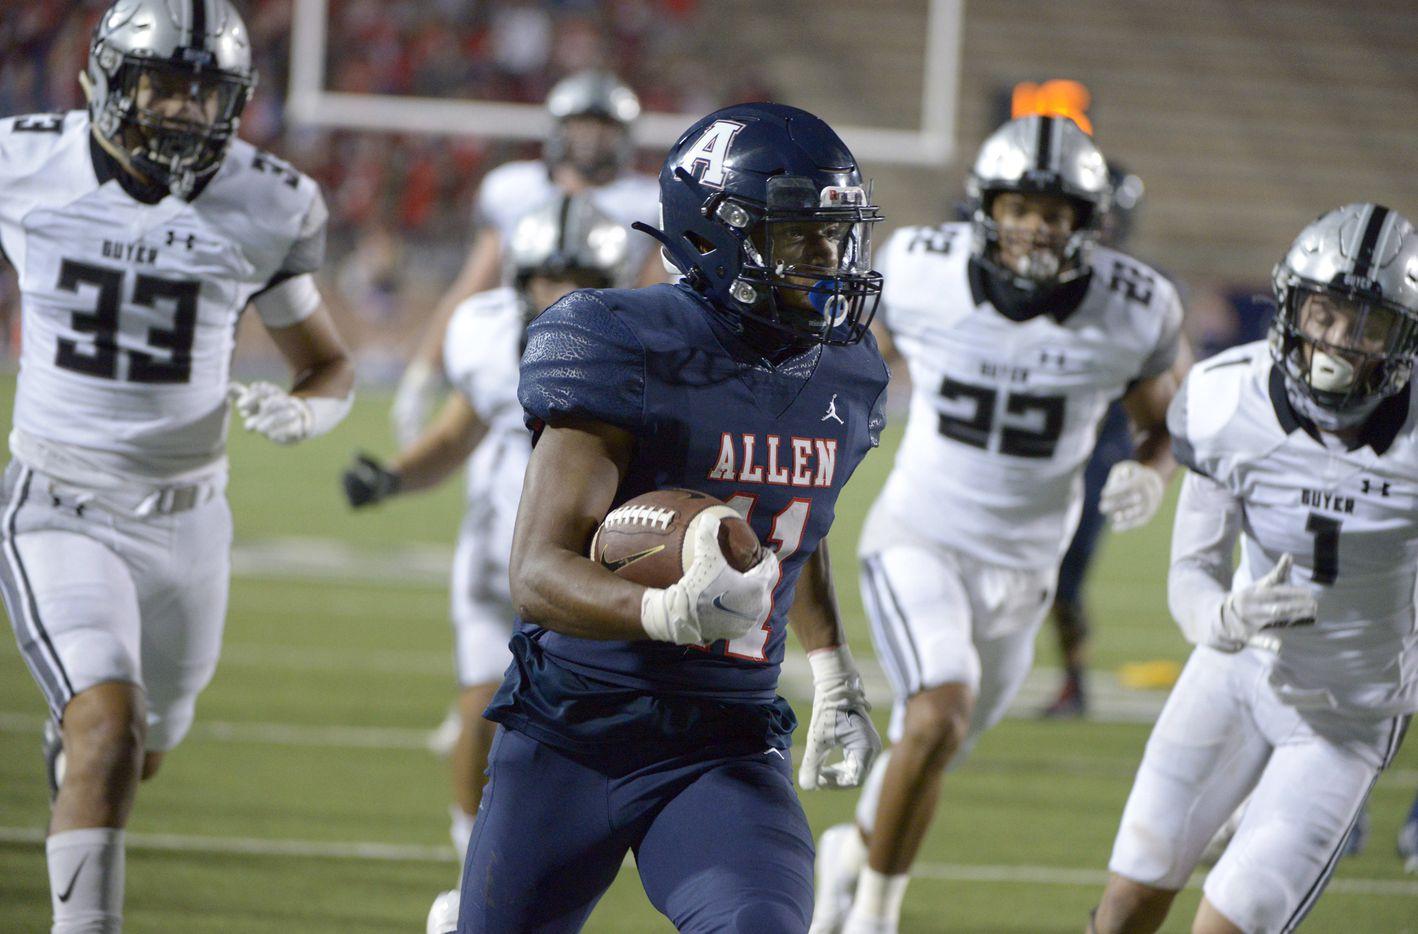 Allen's Jordan Johnston (11) runs upfield in the third quarter of a high school football game between Denton Guyer and Allen, Friday, Nov. 13, 2020, in Allen, Texas. (Matt Strasen/Special Contributor)